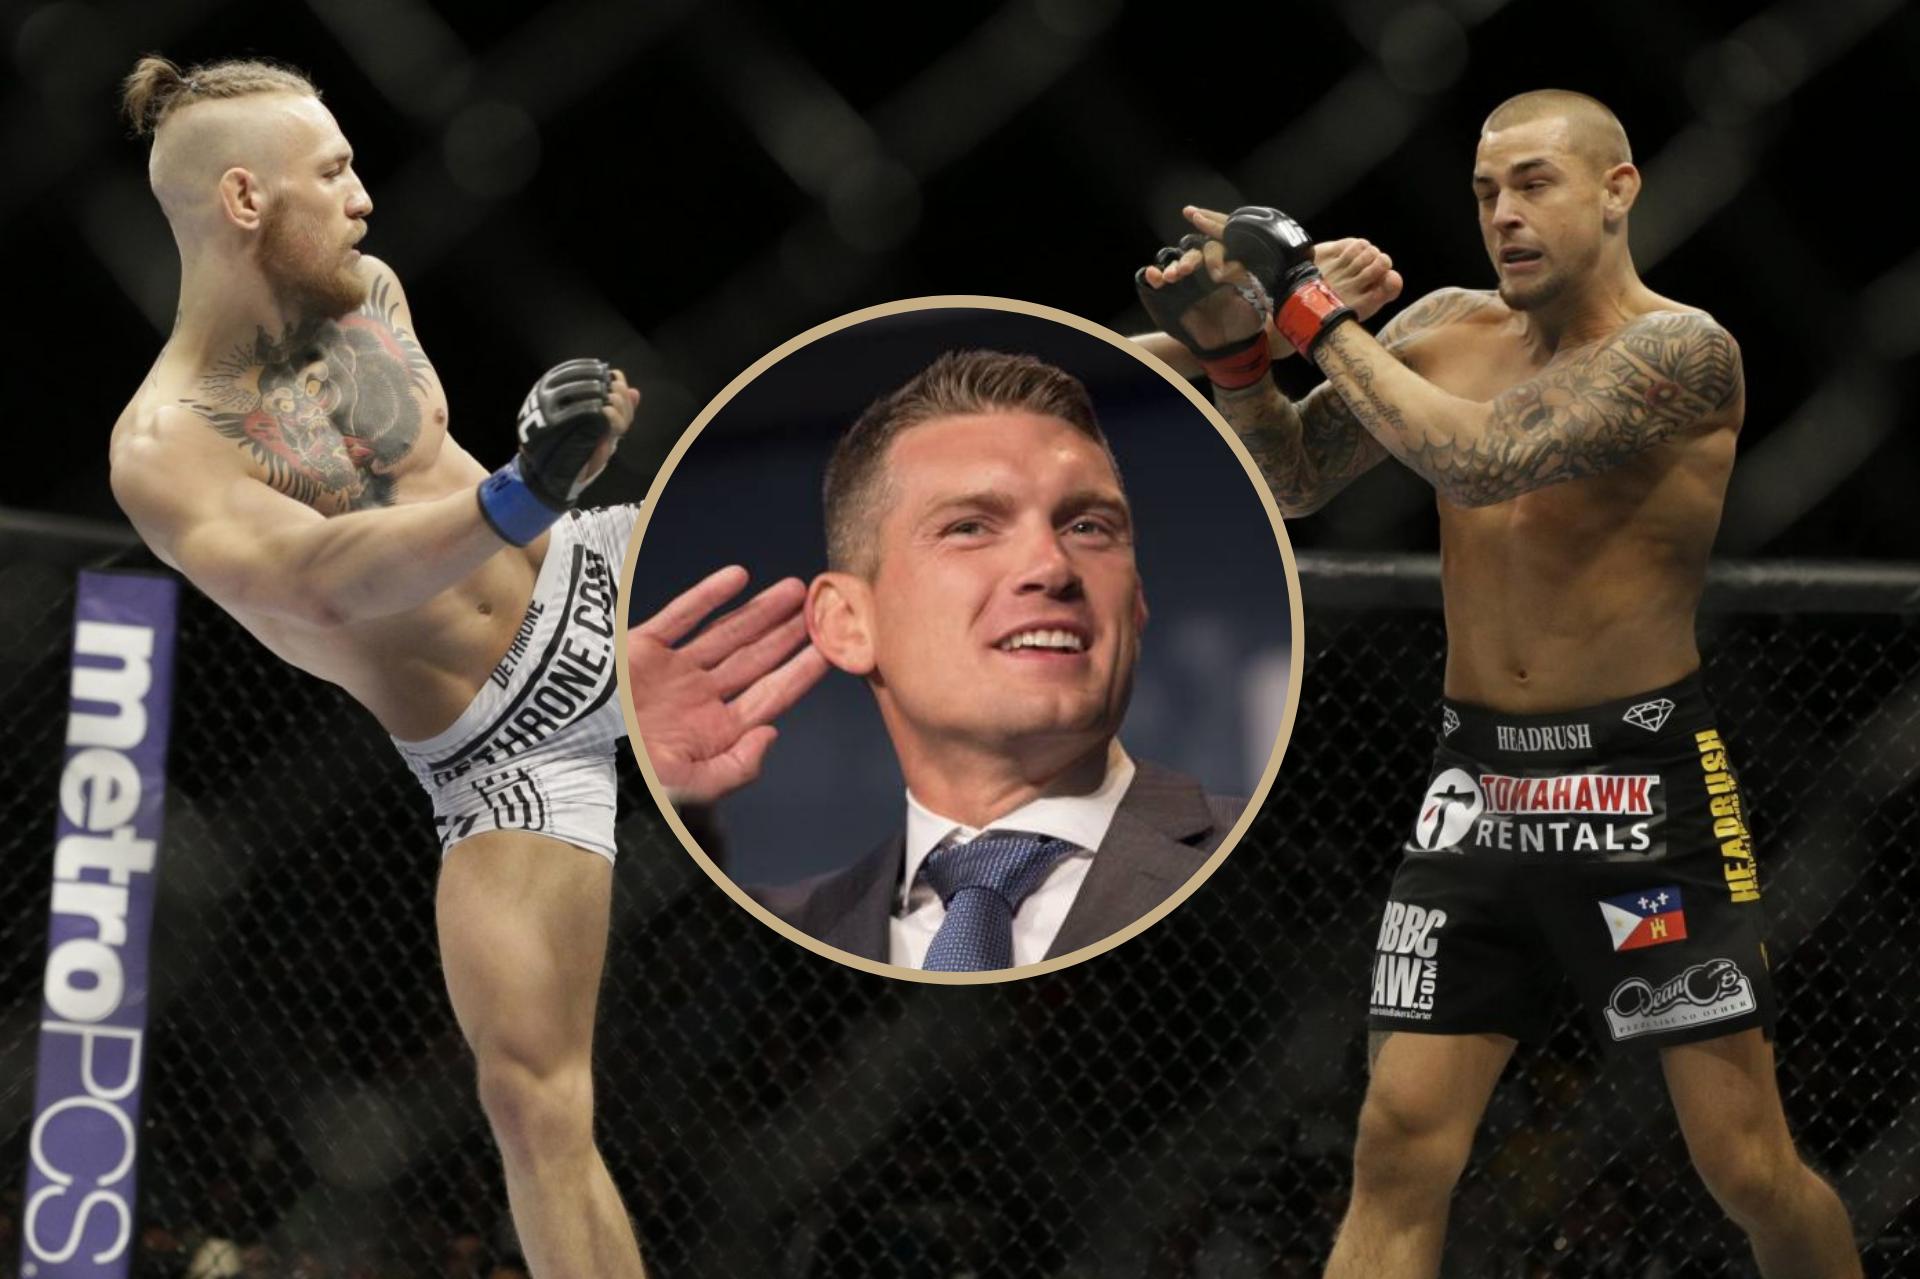 'Wonderboy' gives his prediction for Conor McGregor vs Dustin Poirier scheduled for UFC 257 - Conor McGregor